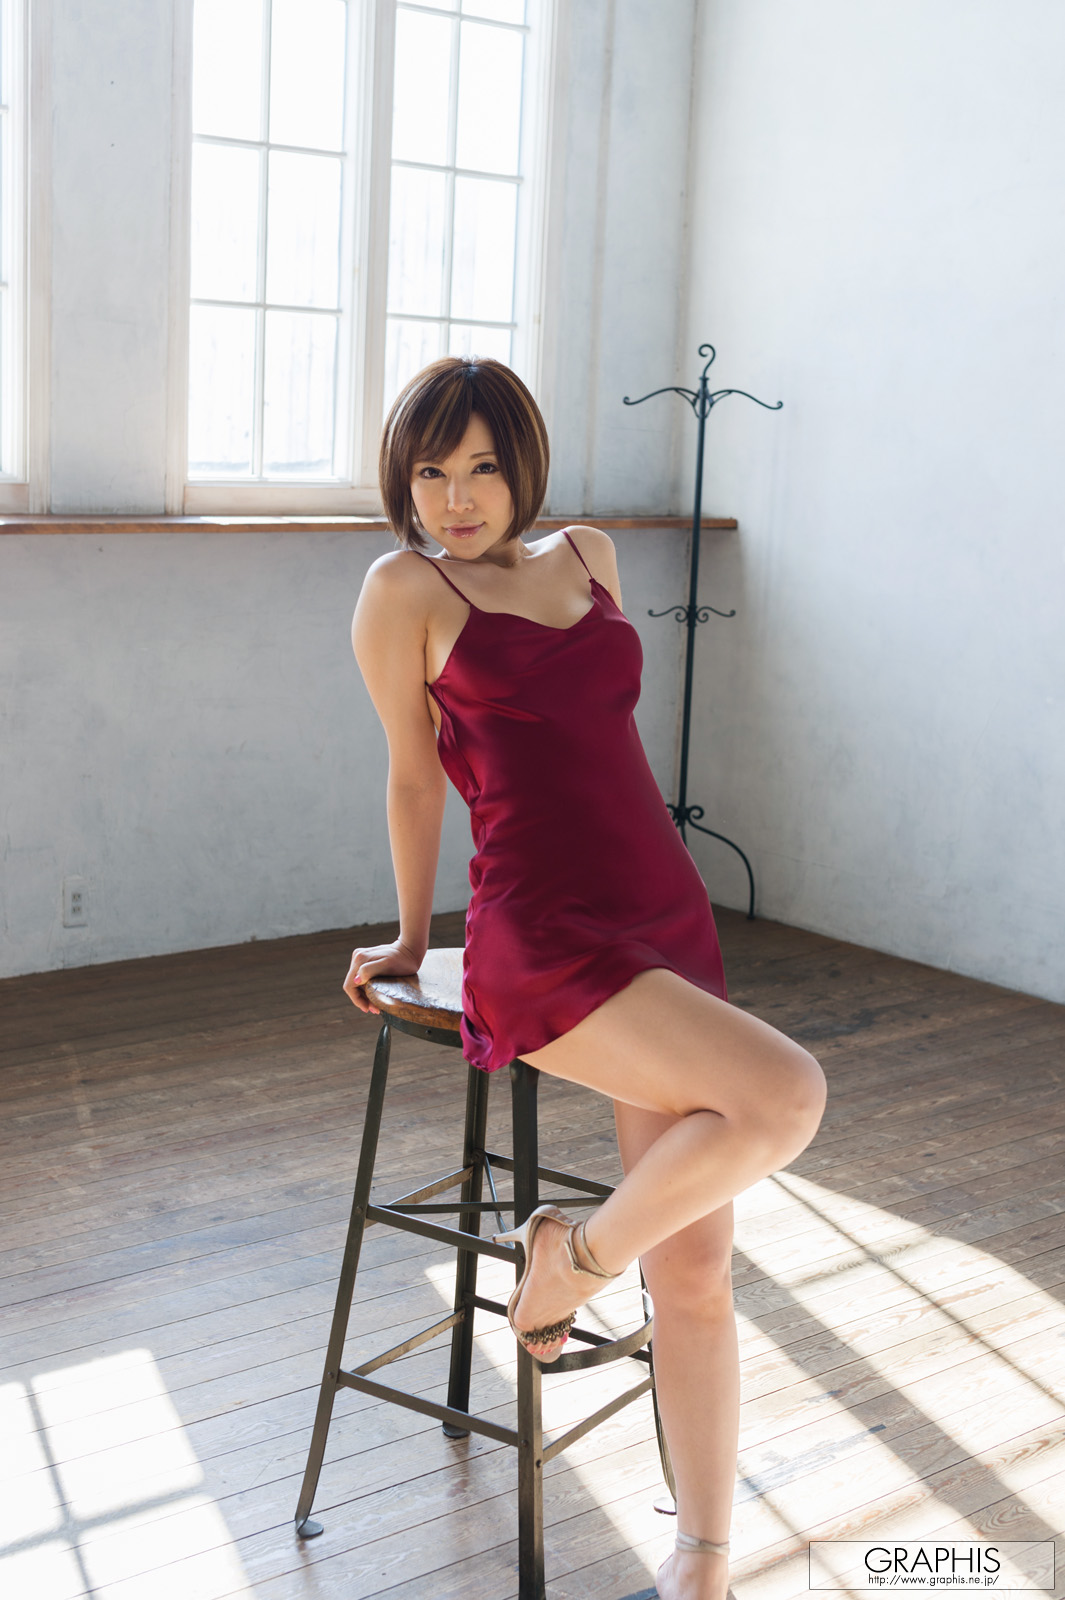 yuria-satomi-purple-nighty-nude-asian-girl-graphis-02